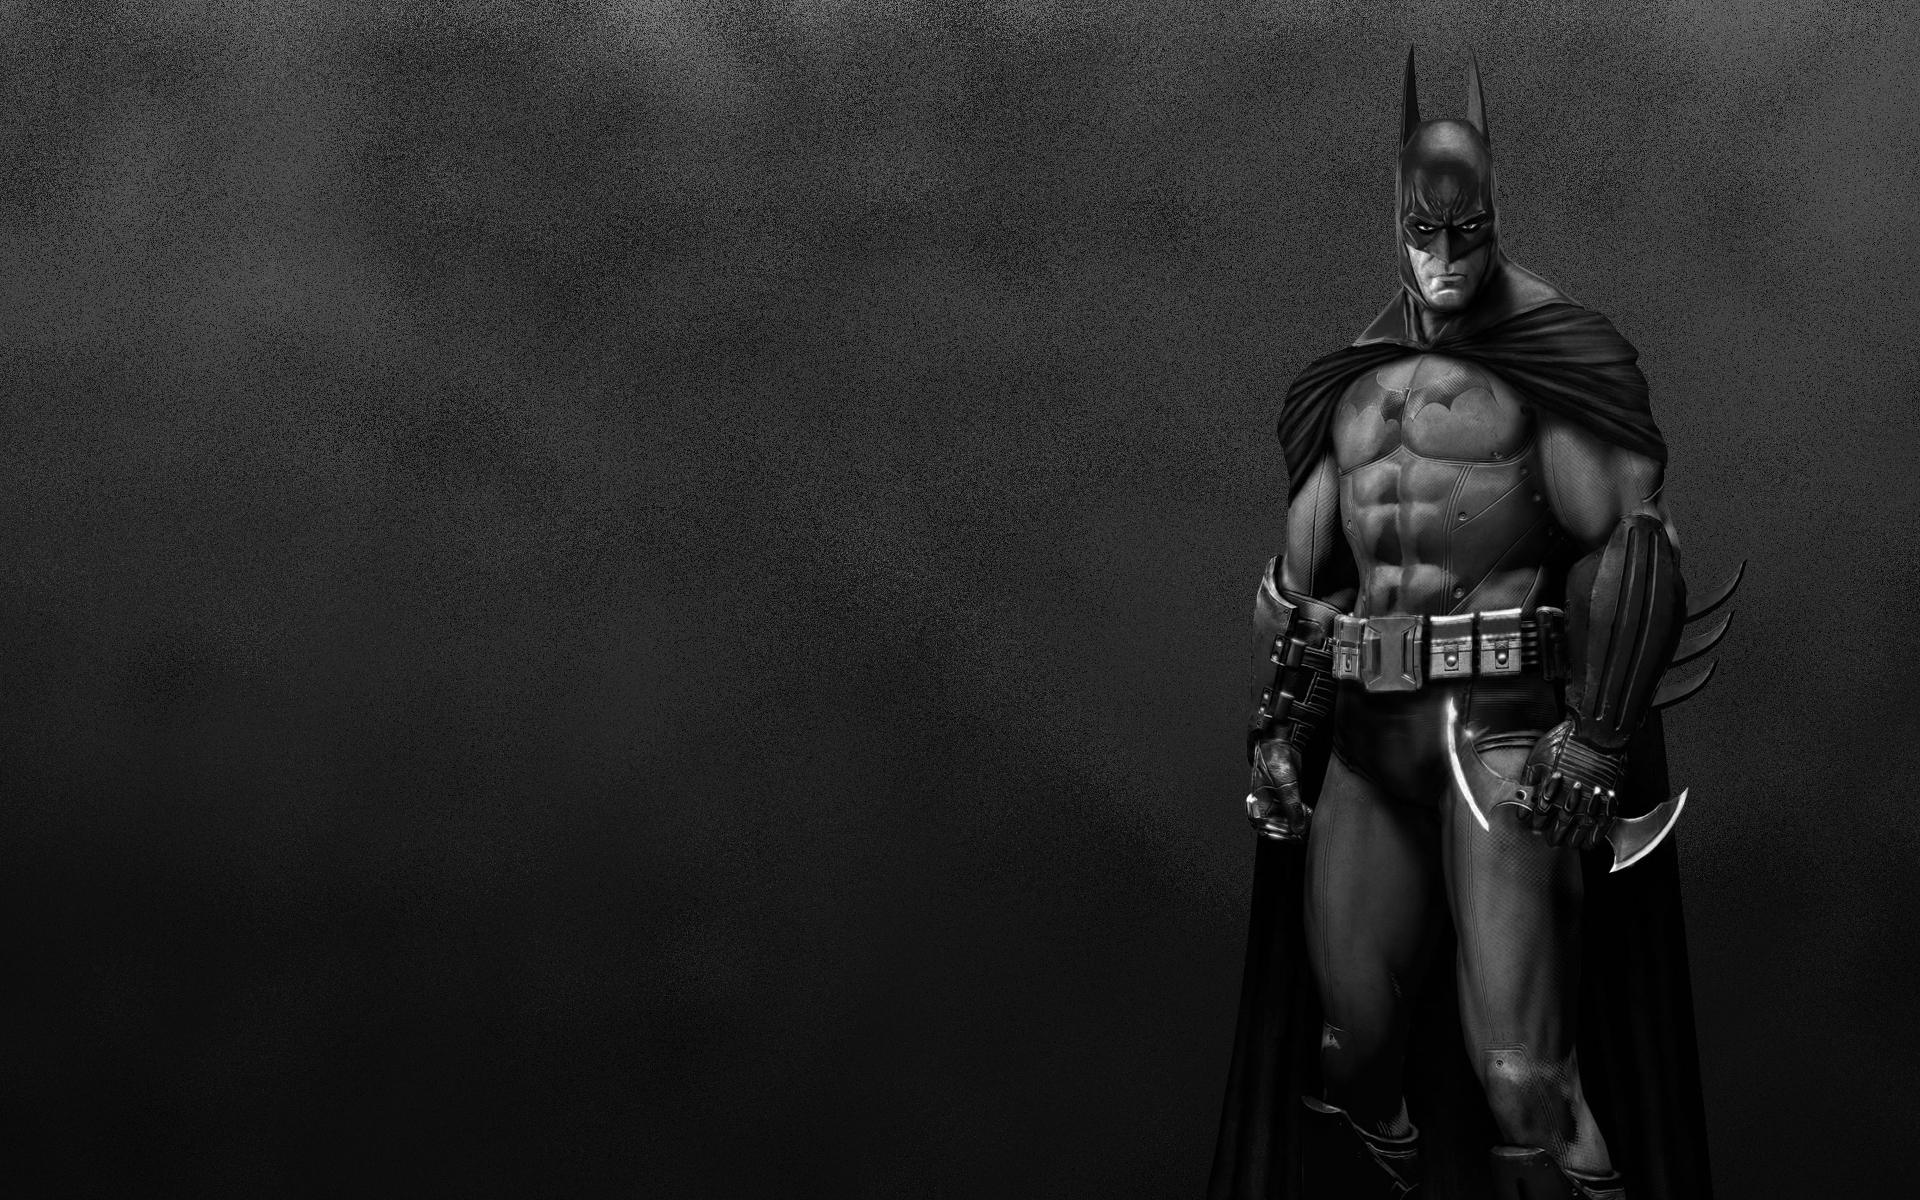 Batman Hd Wallpapers For Desktop